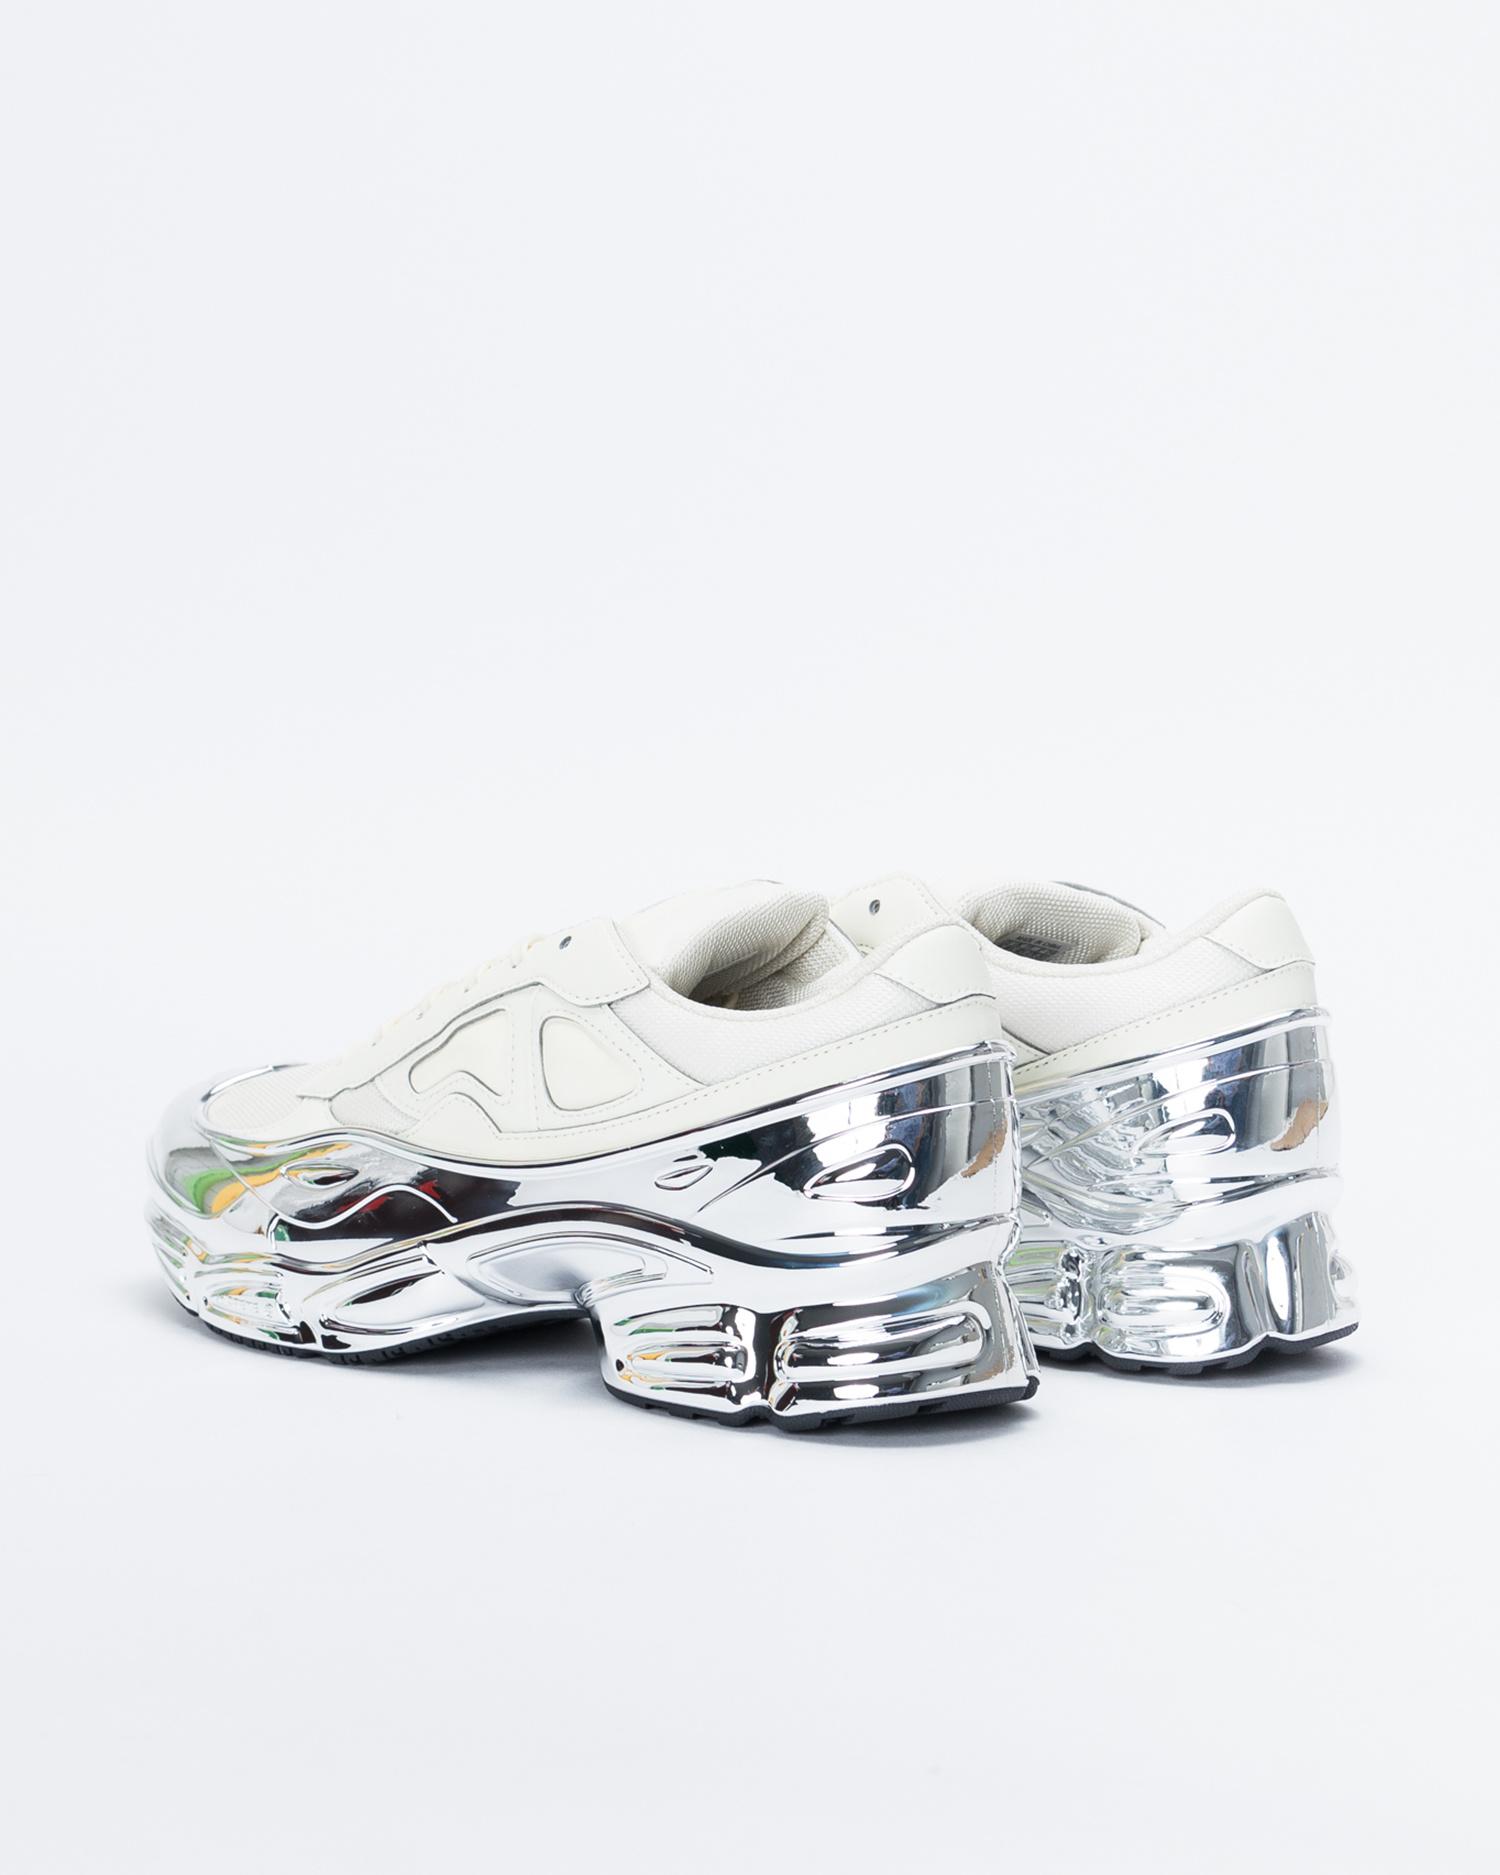 Adidas Raf Simons Ozweego Cwhite/Silvmt/Silvmt